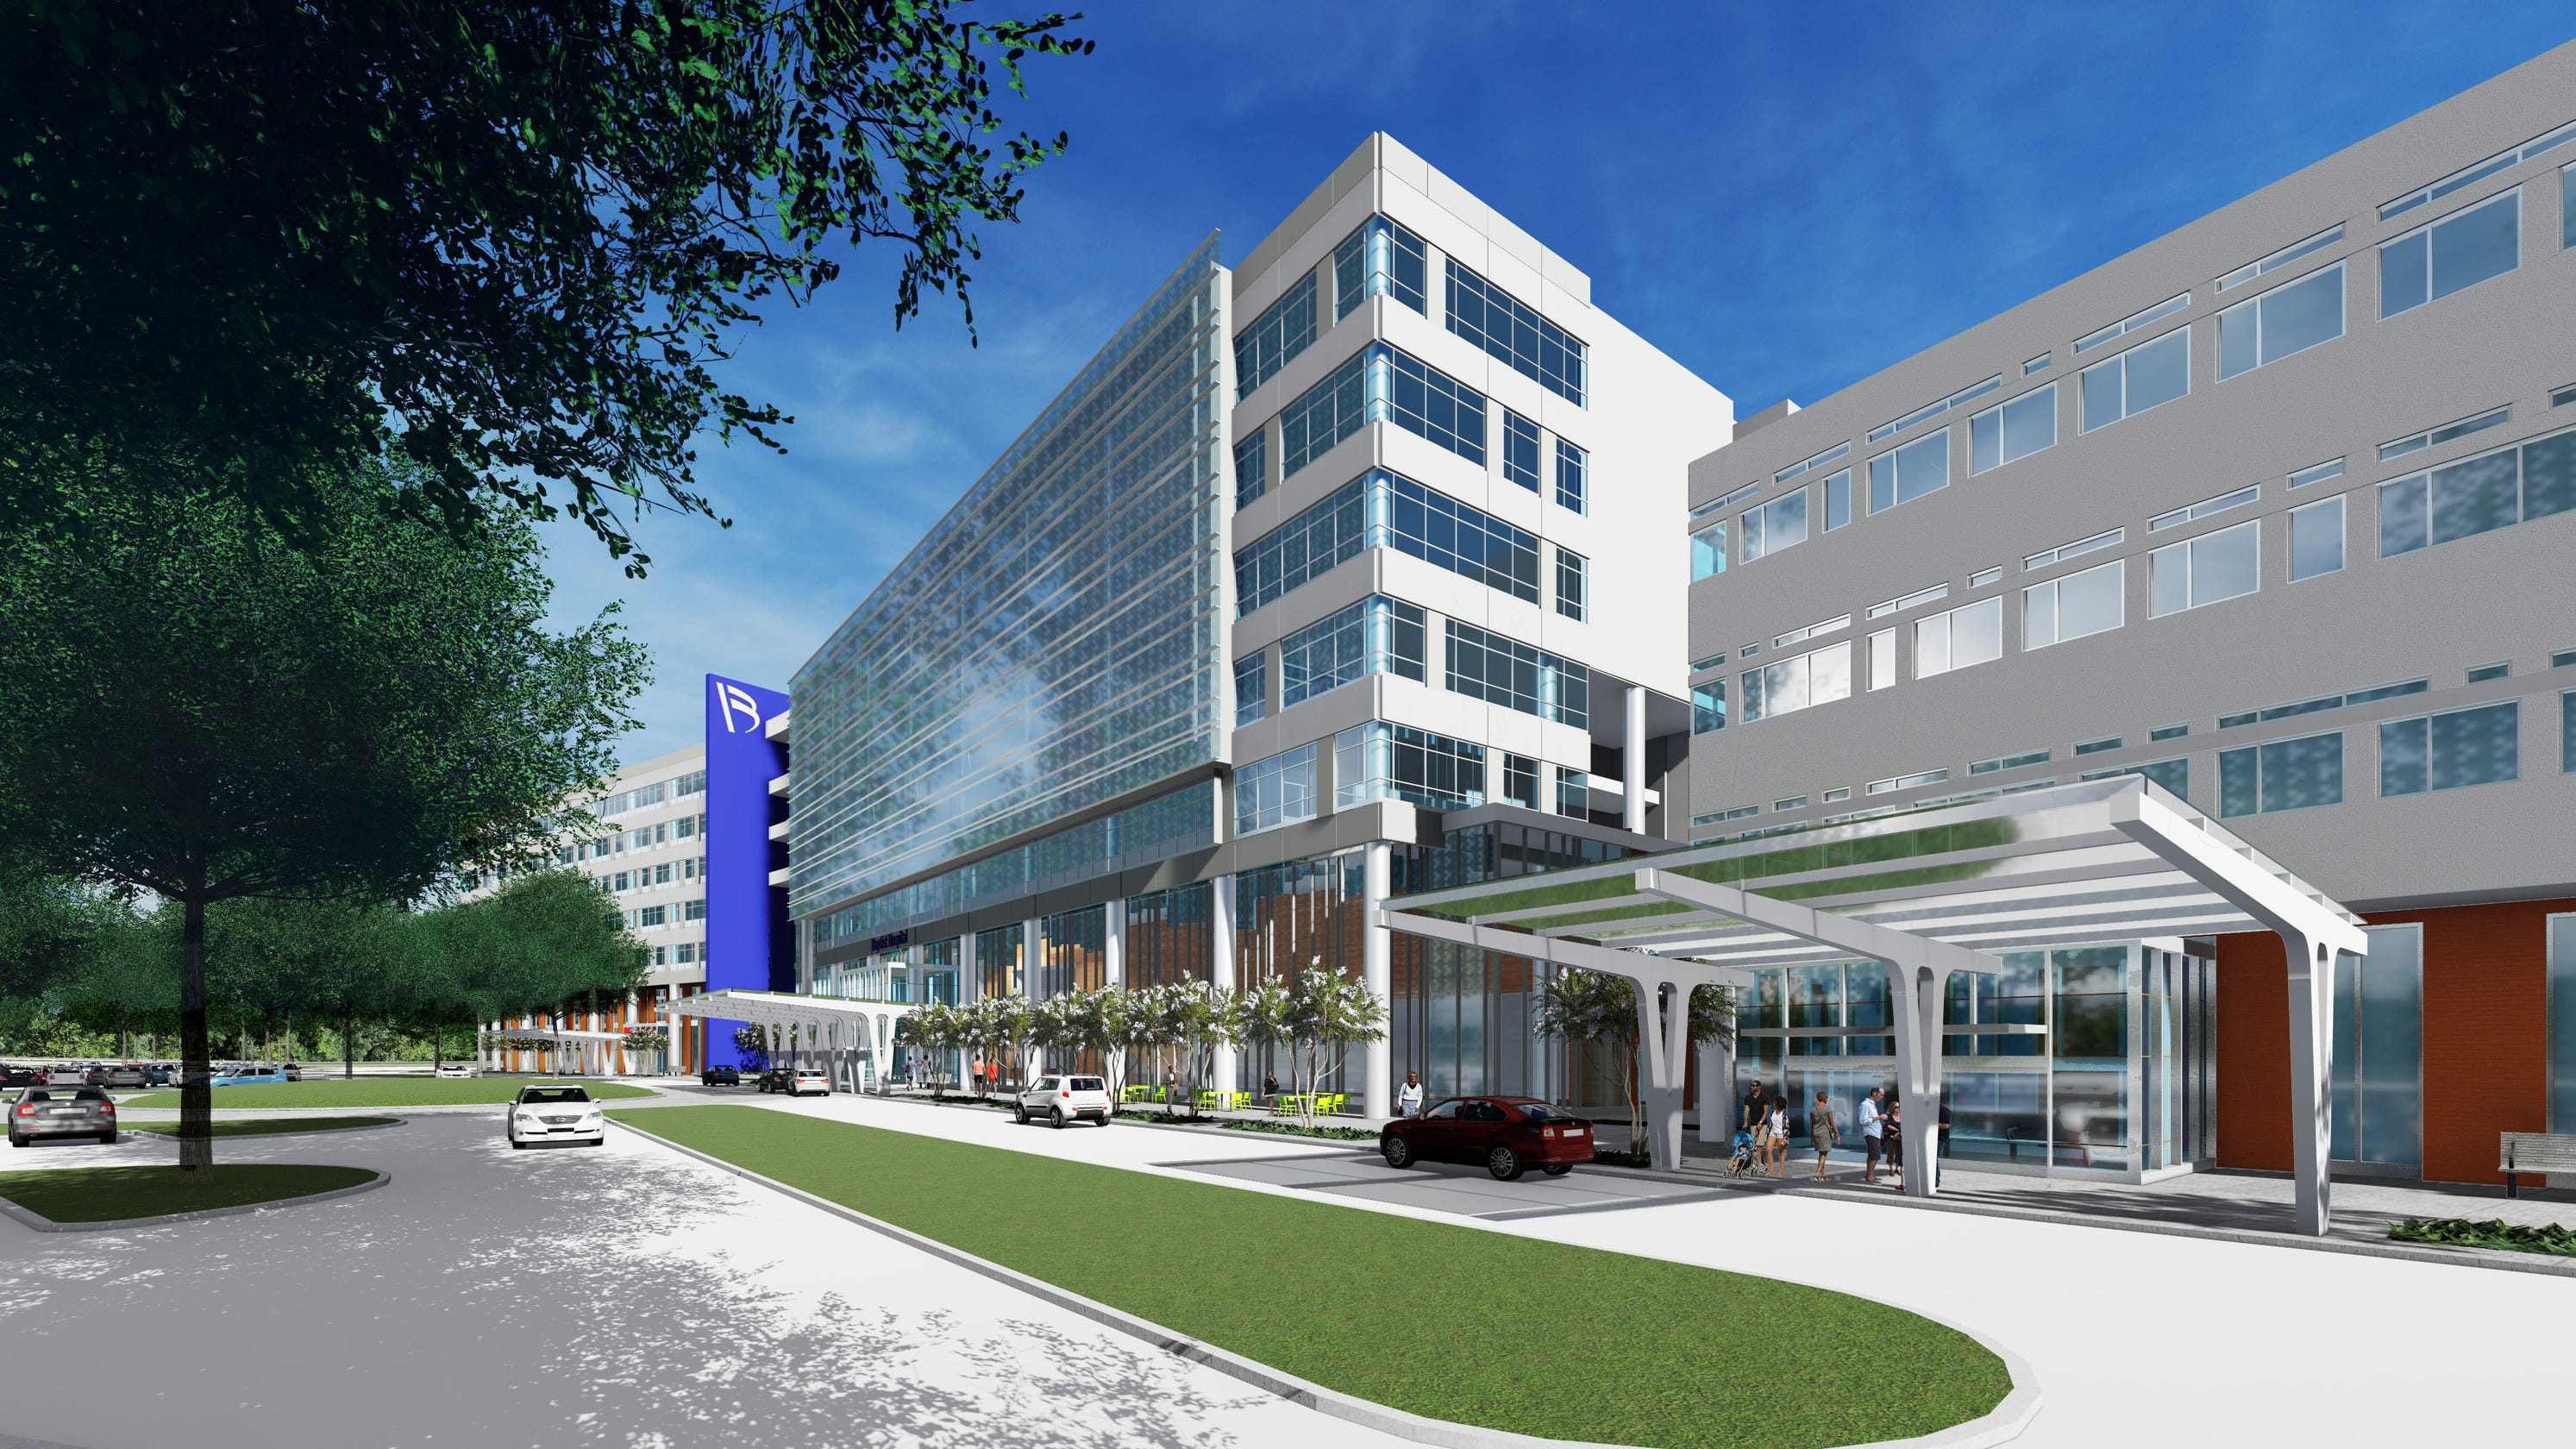 Baptist Hospital announces new hospital at Brent Lane in